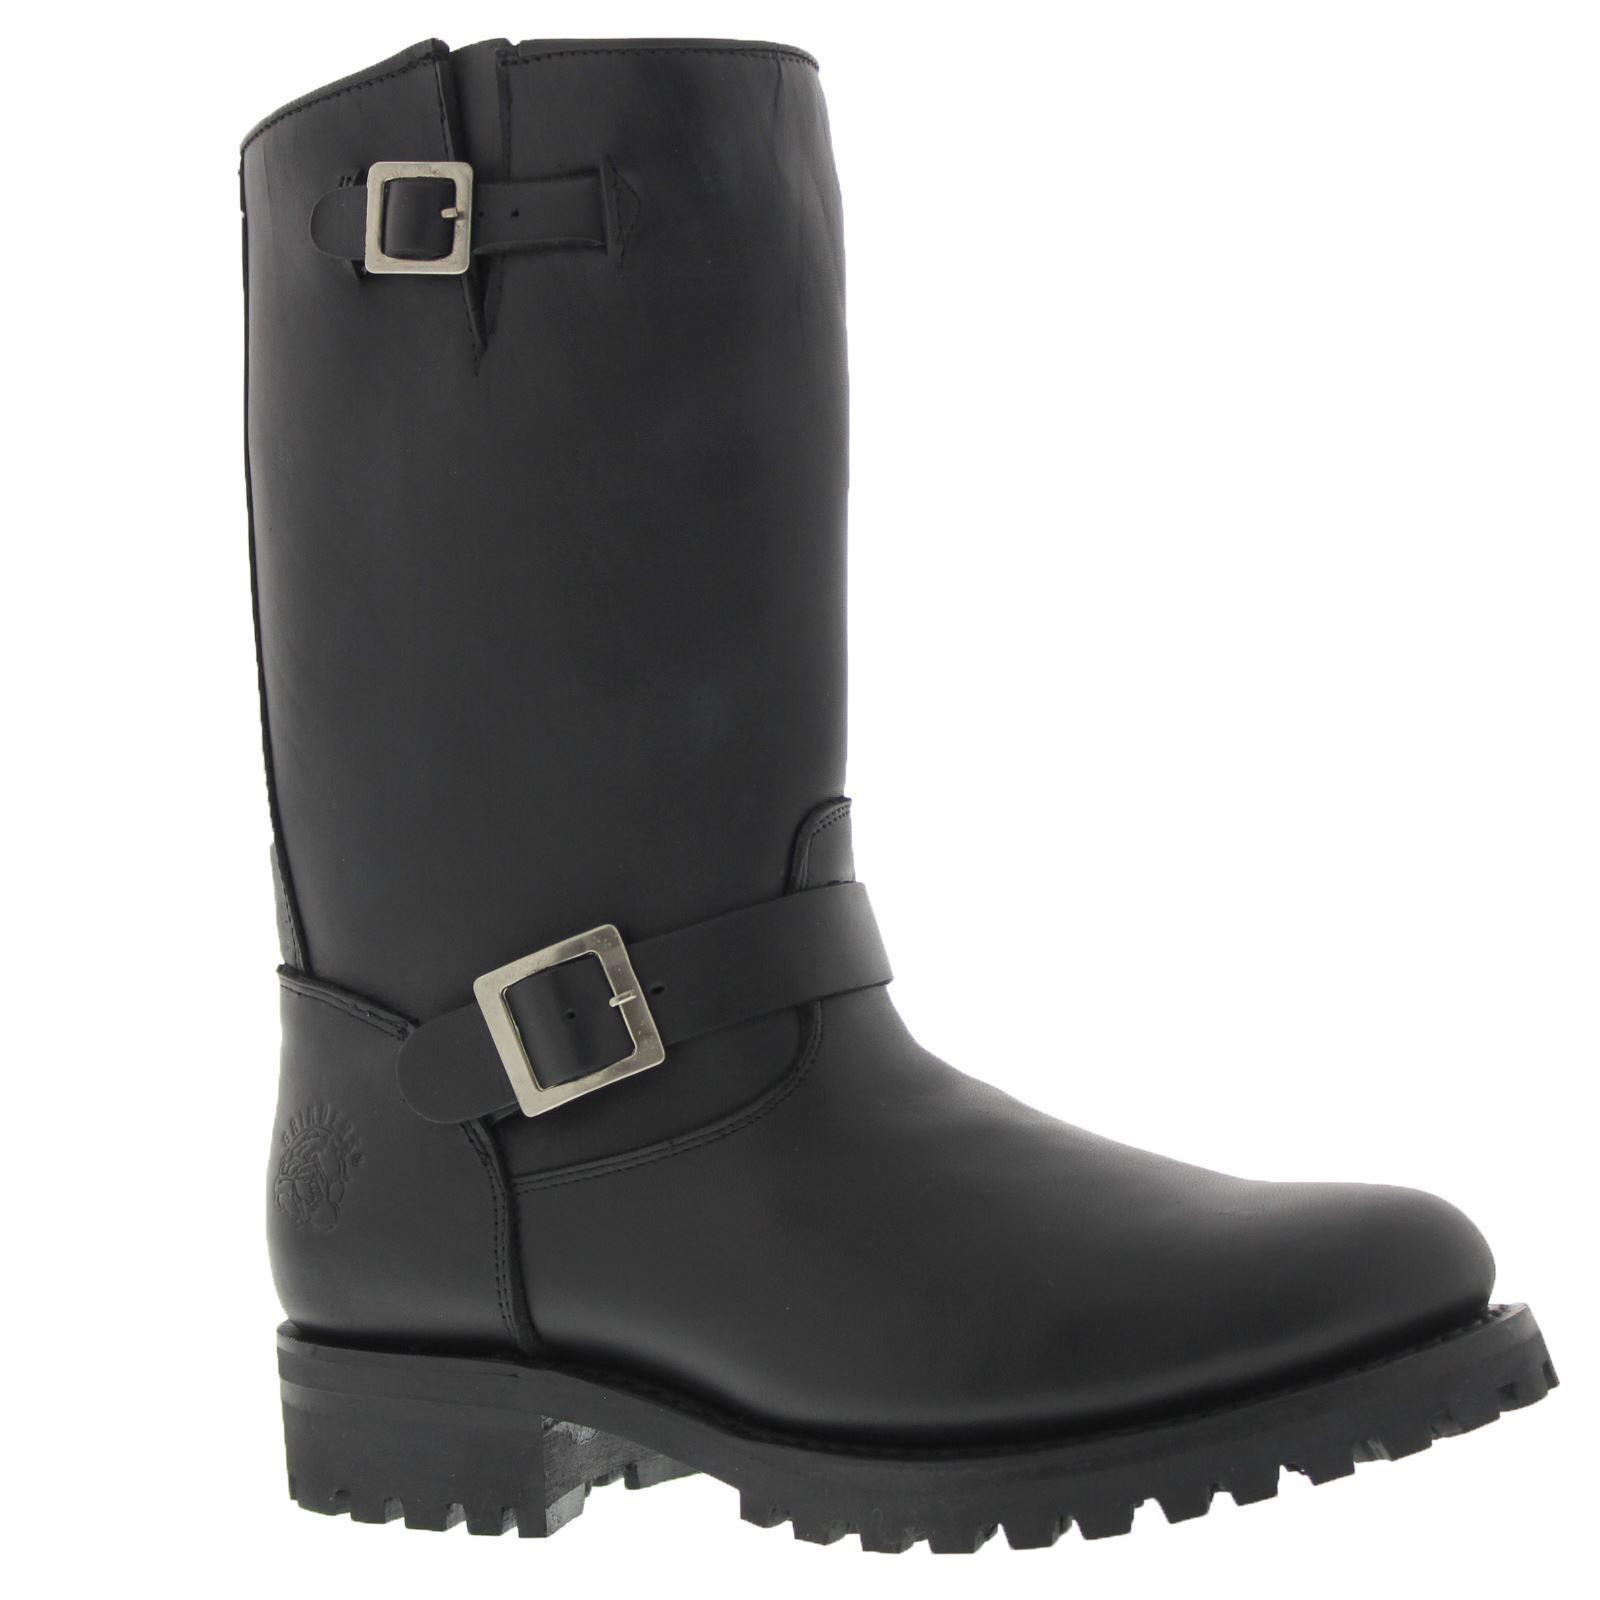 Grandes zapatos con descuento Grinders Wild One Oily Full Black Womens Premium Leather Biker Boots